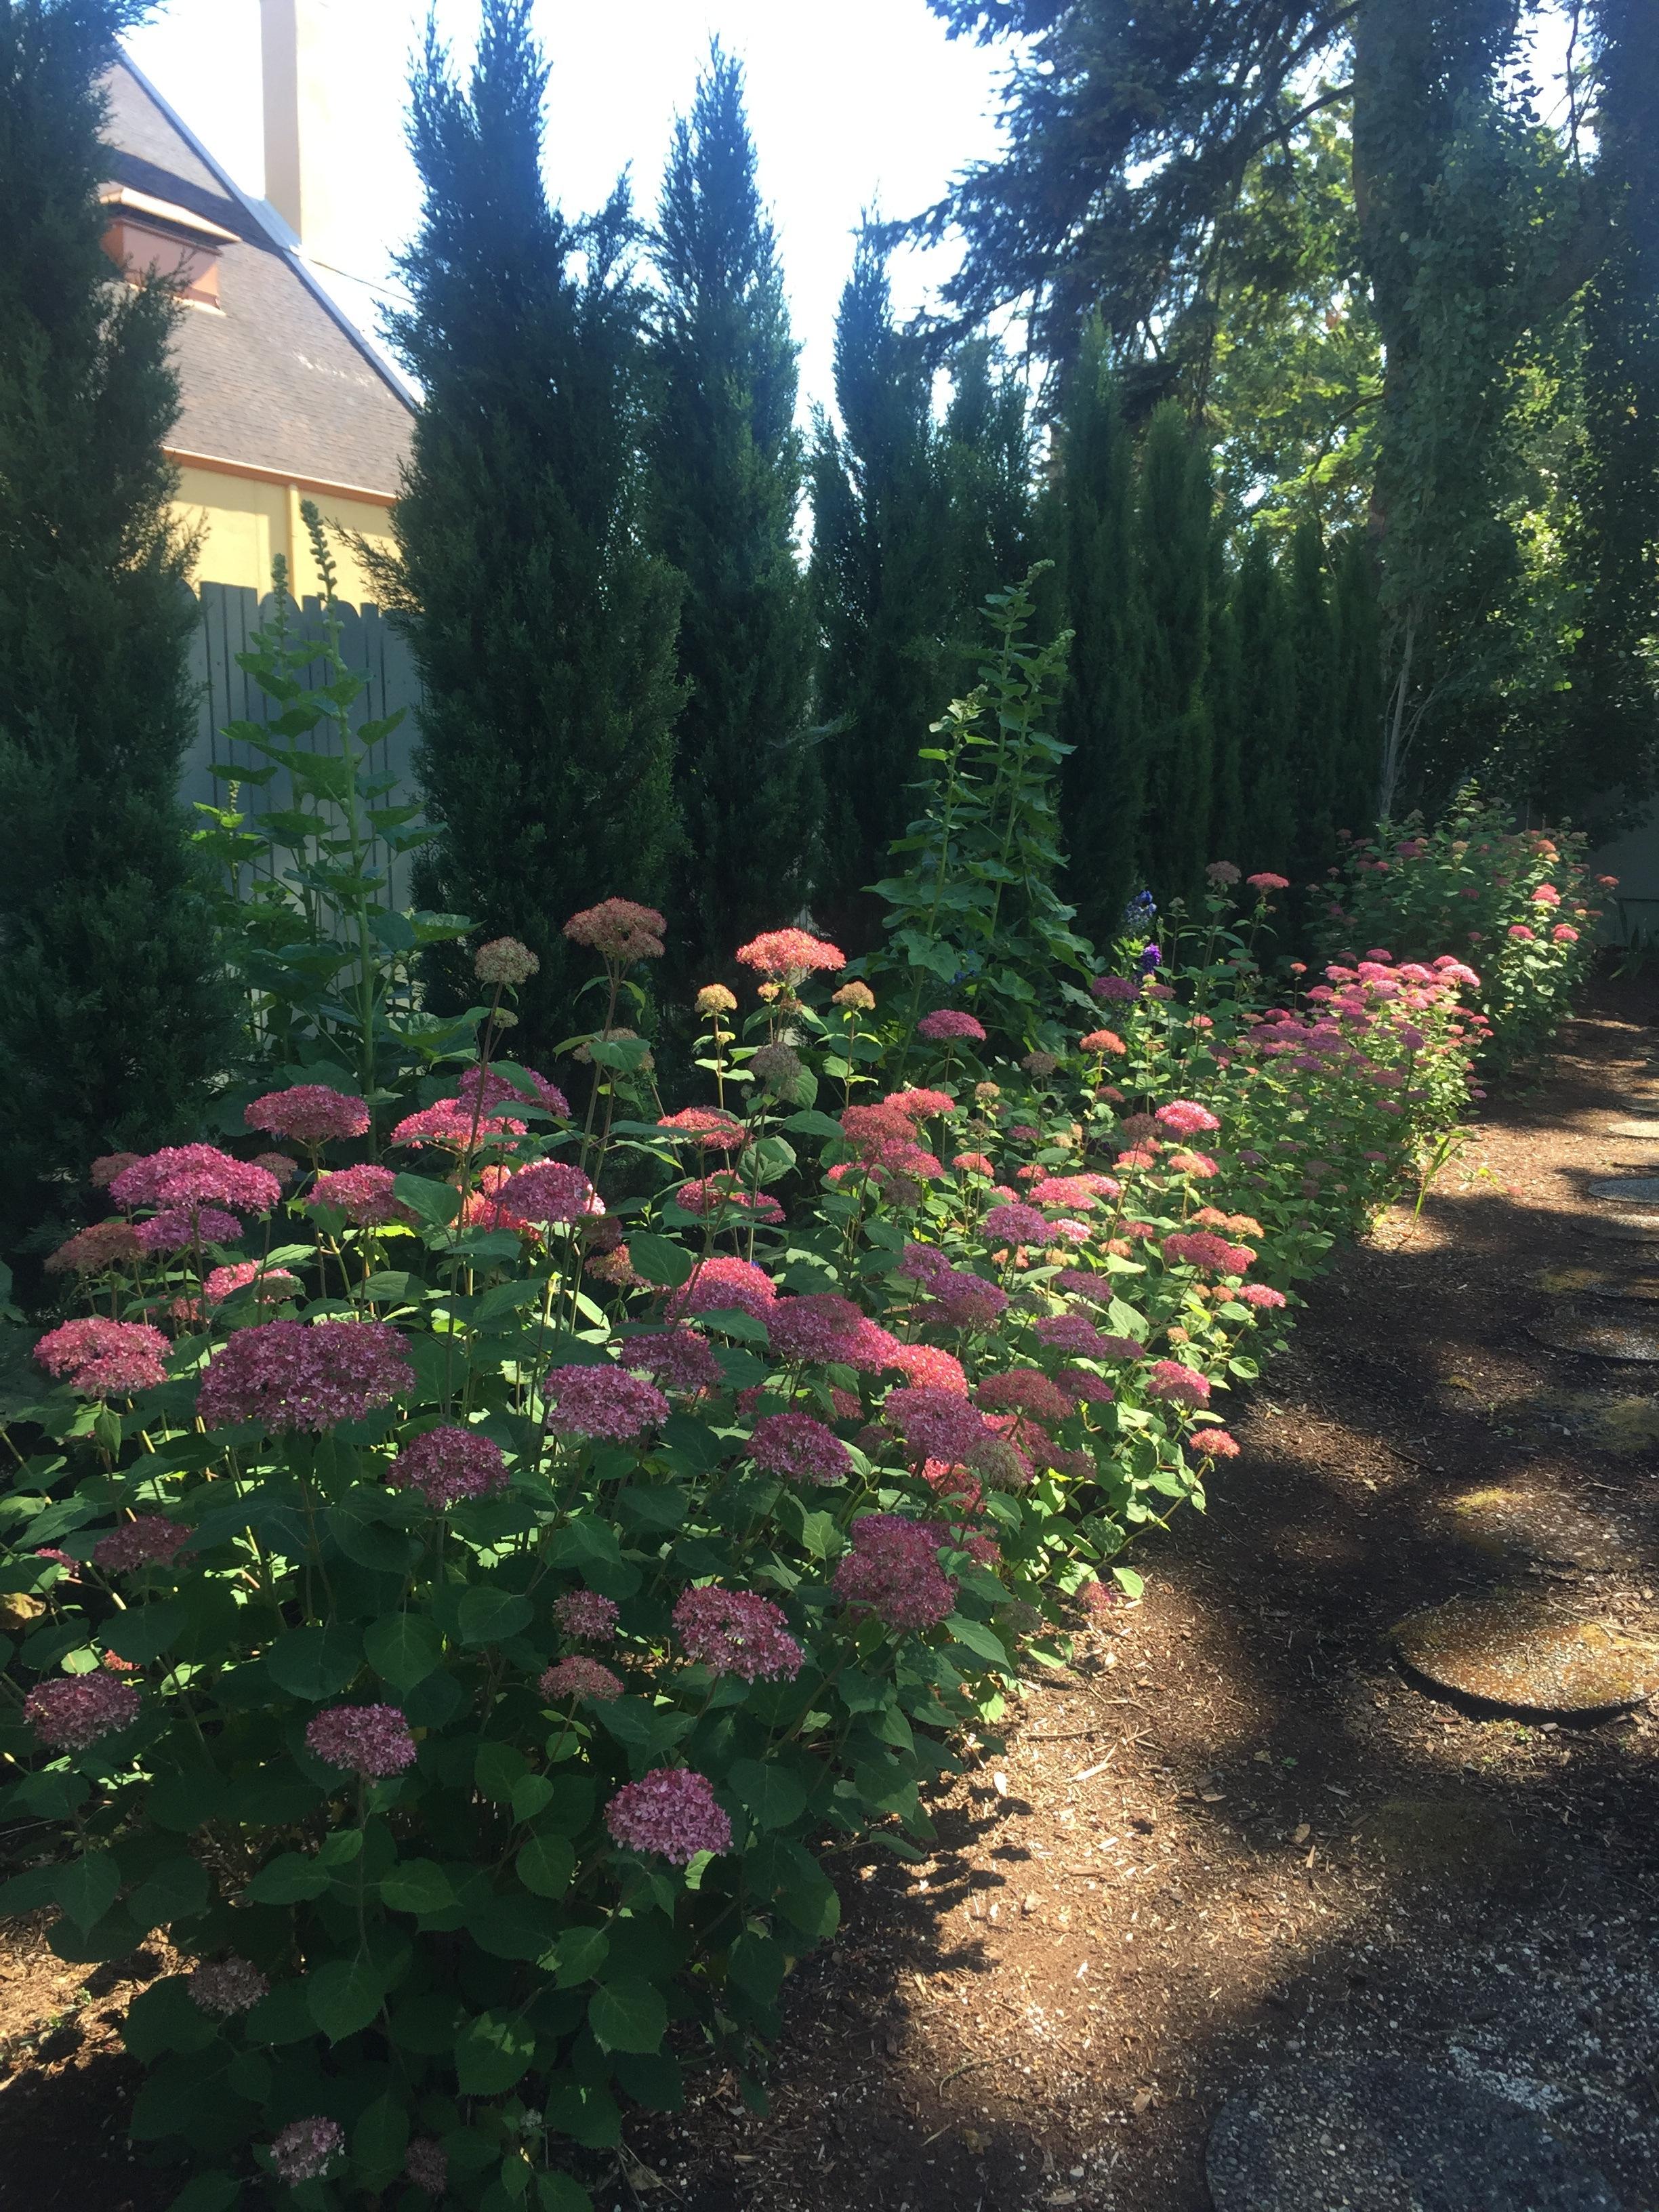 Hydrangeas and Hollyhocks